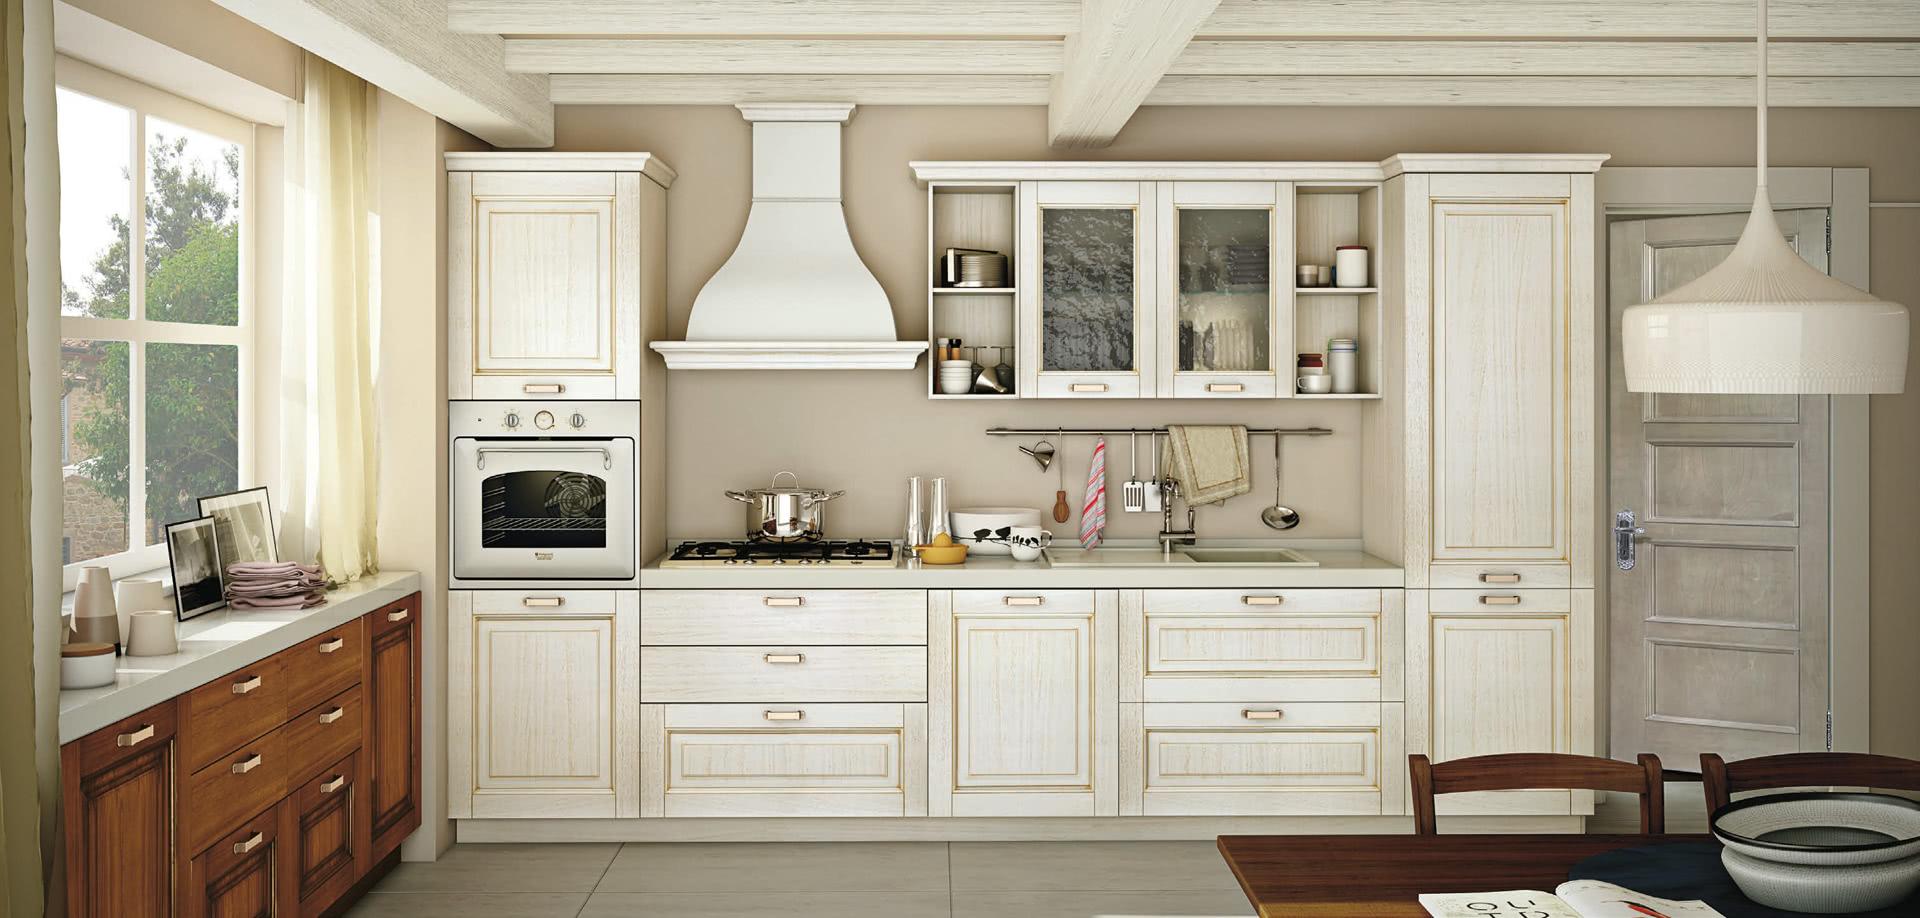 1496_oprah-cucina-ambientata-2